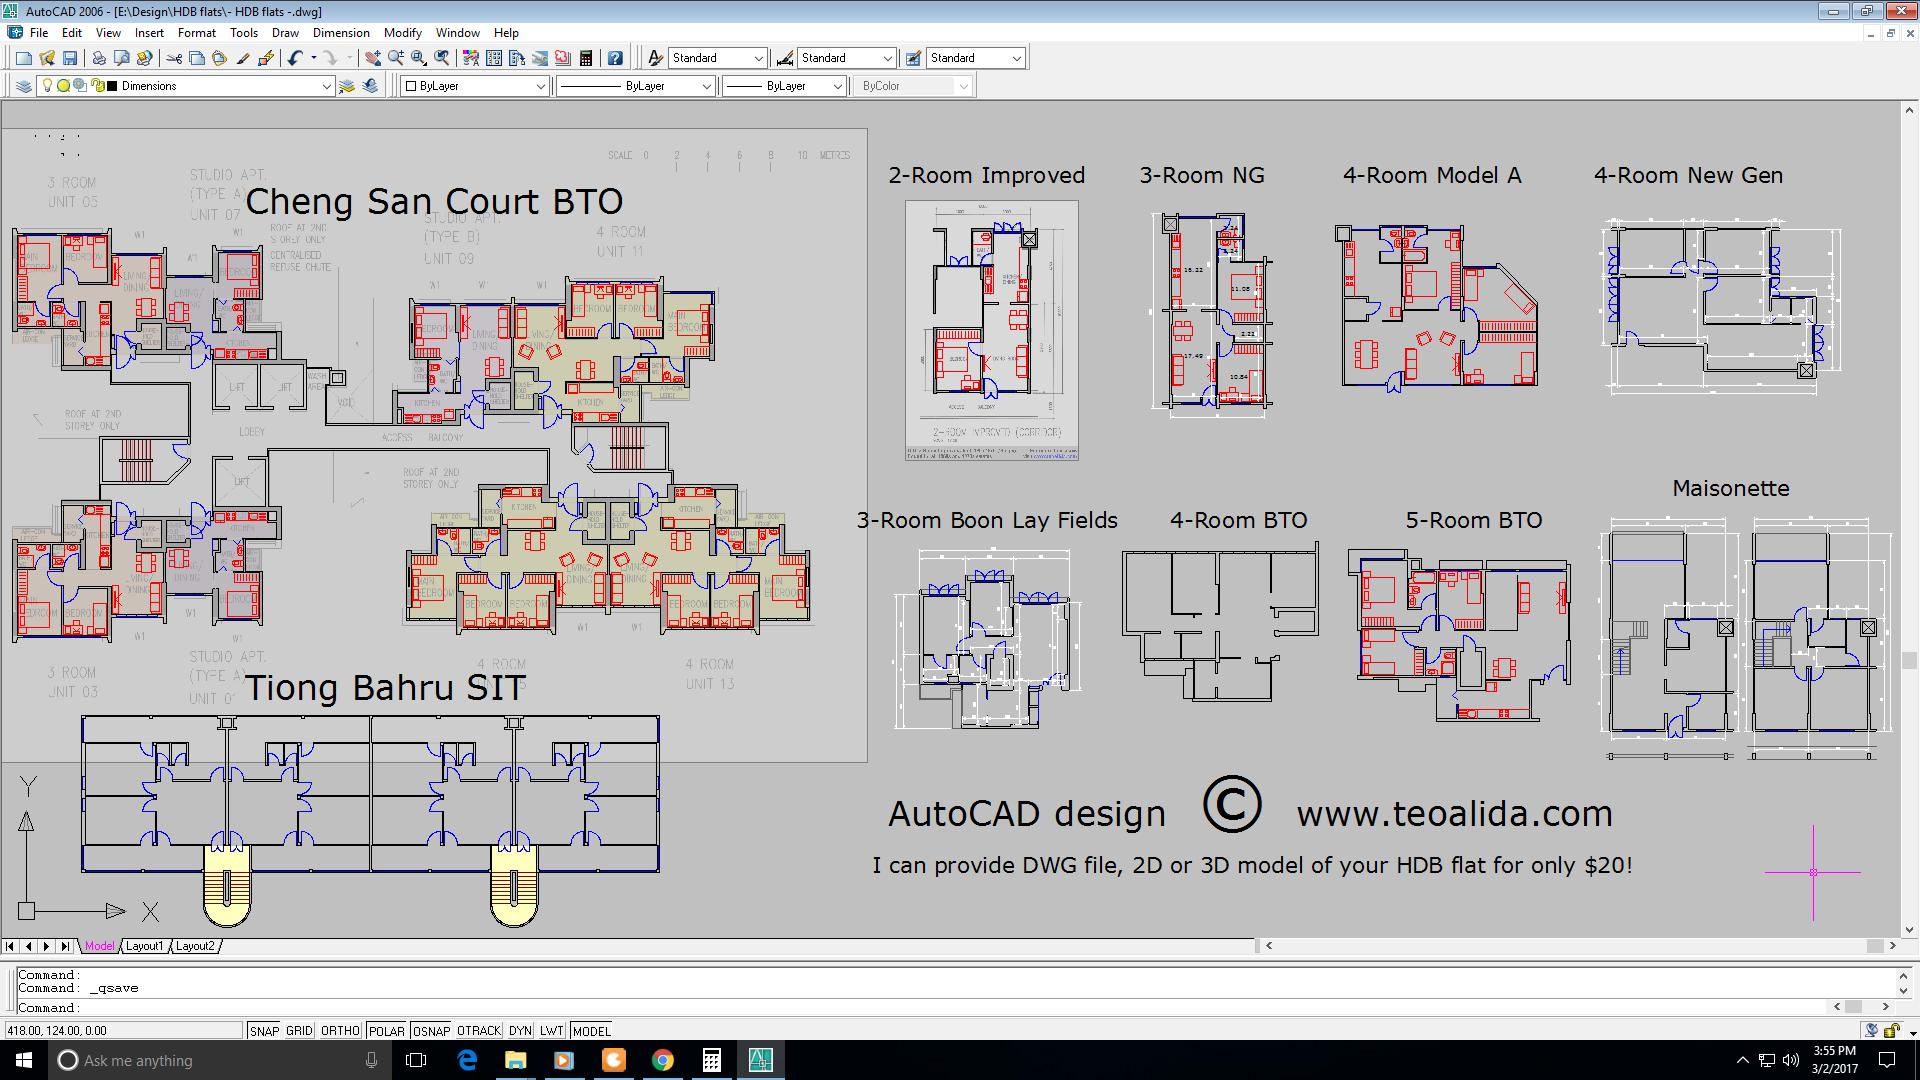 Hdb Floor Plans In Dwg Format Autocad Design The World Of Teoalida